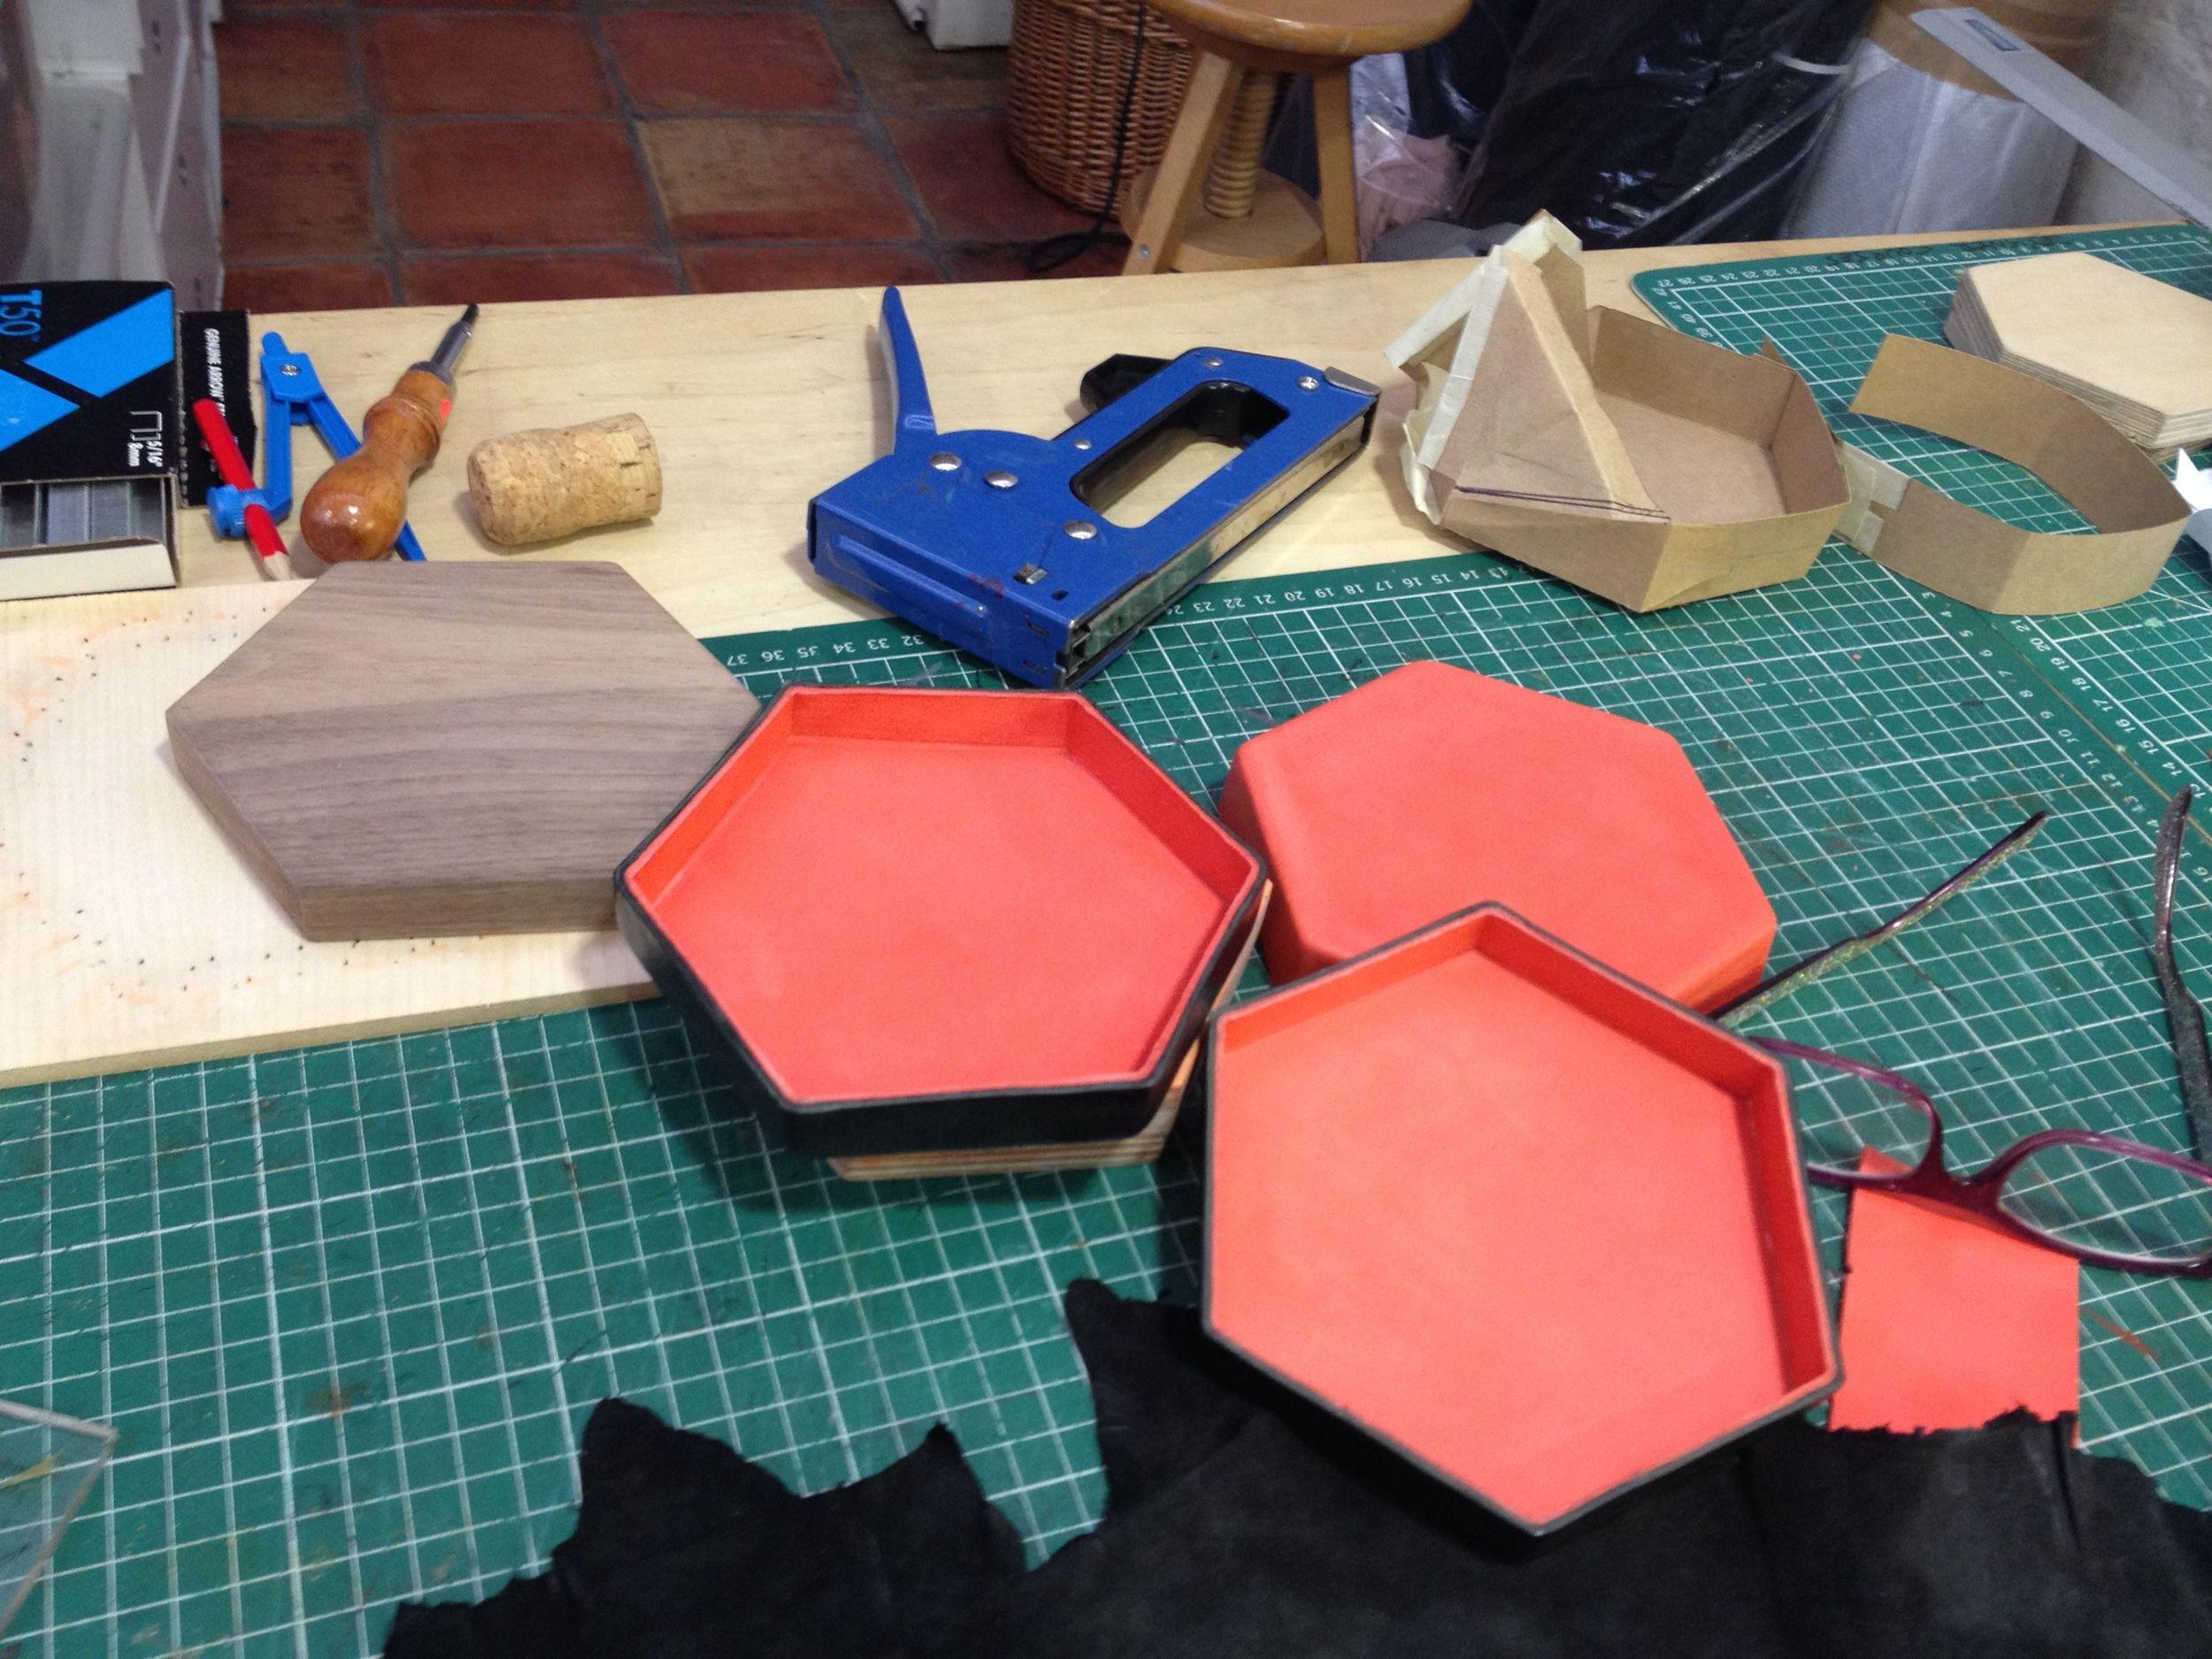 Moulded Clutch bag in progress